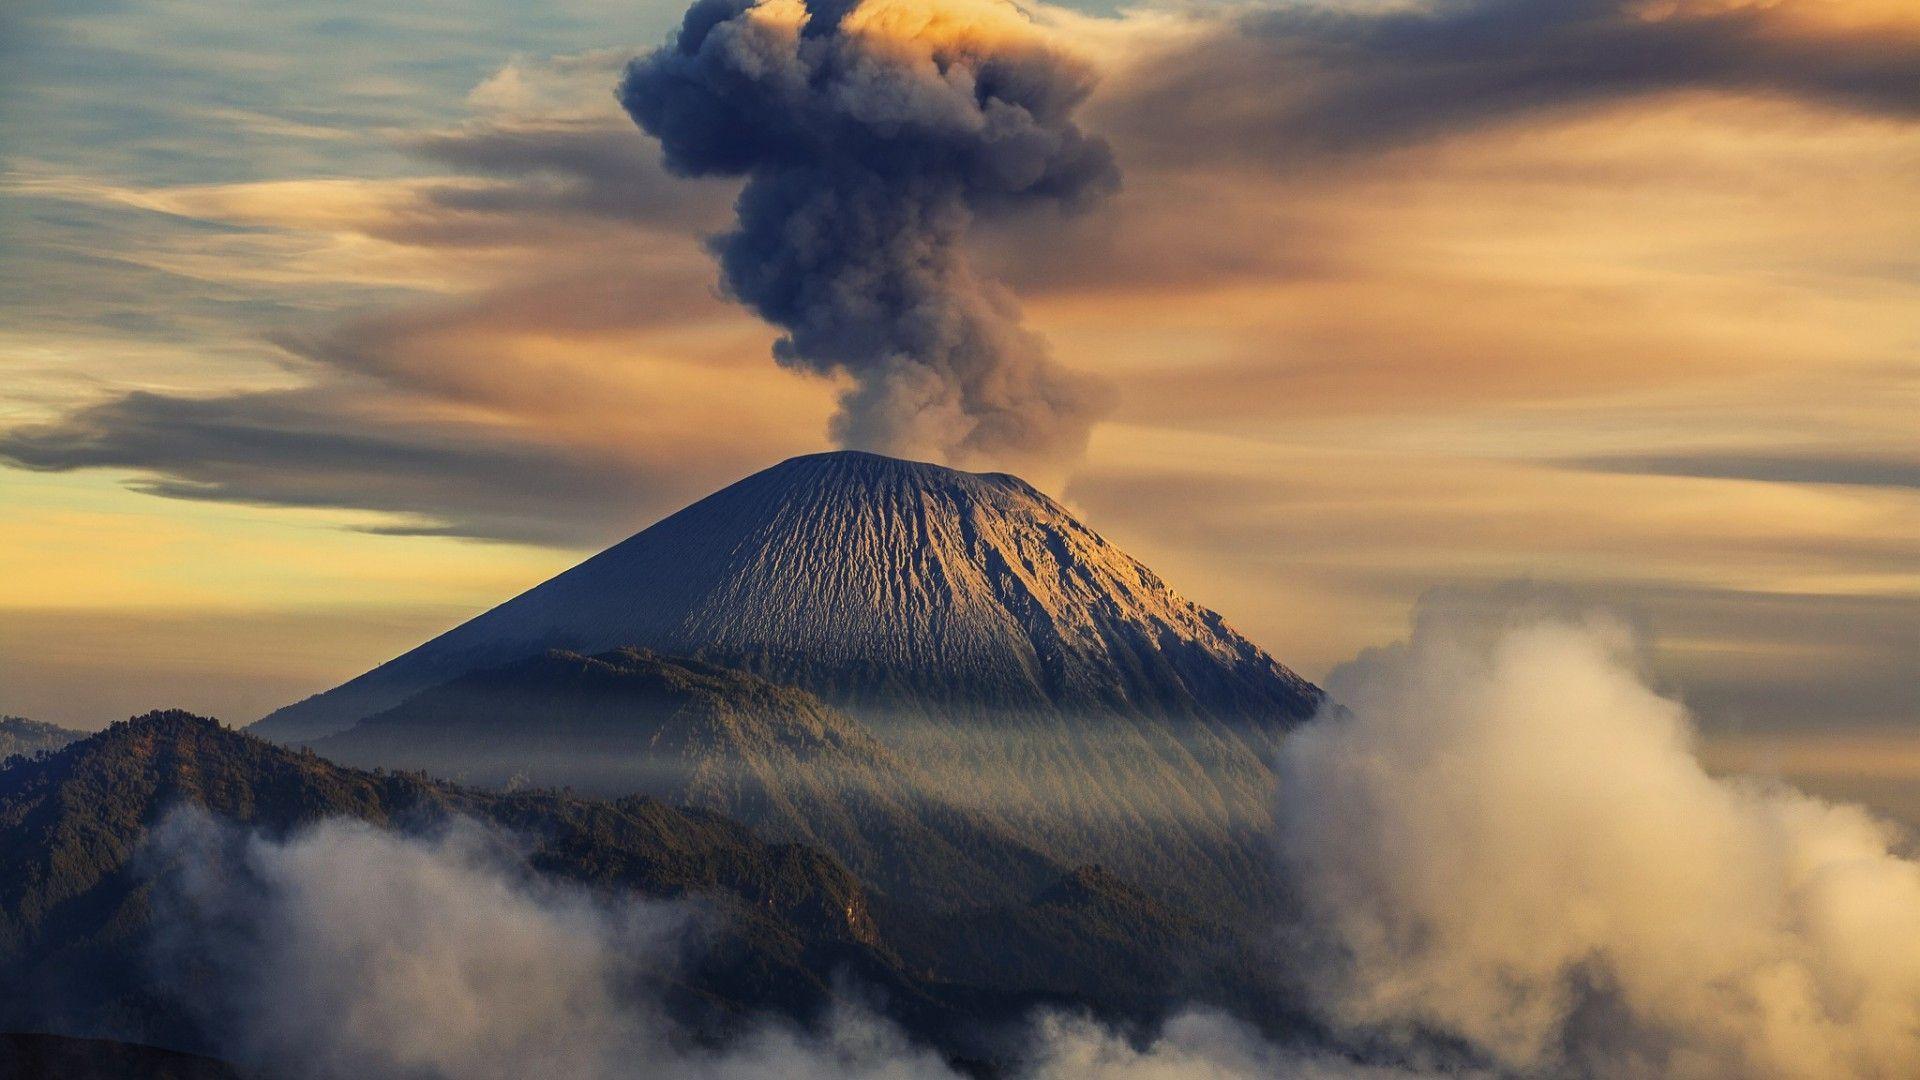 Volcano Smoke Wallpaper 42565 1920x1080 px